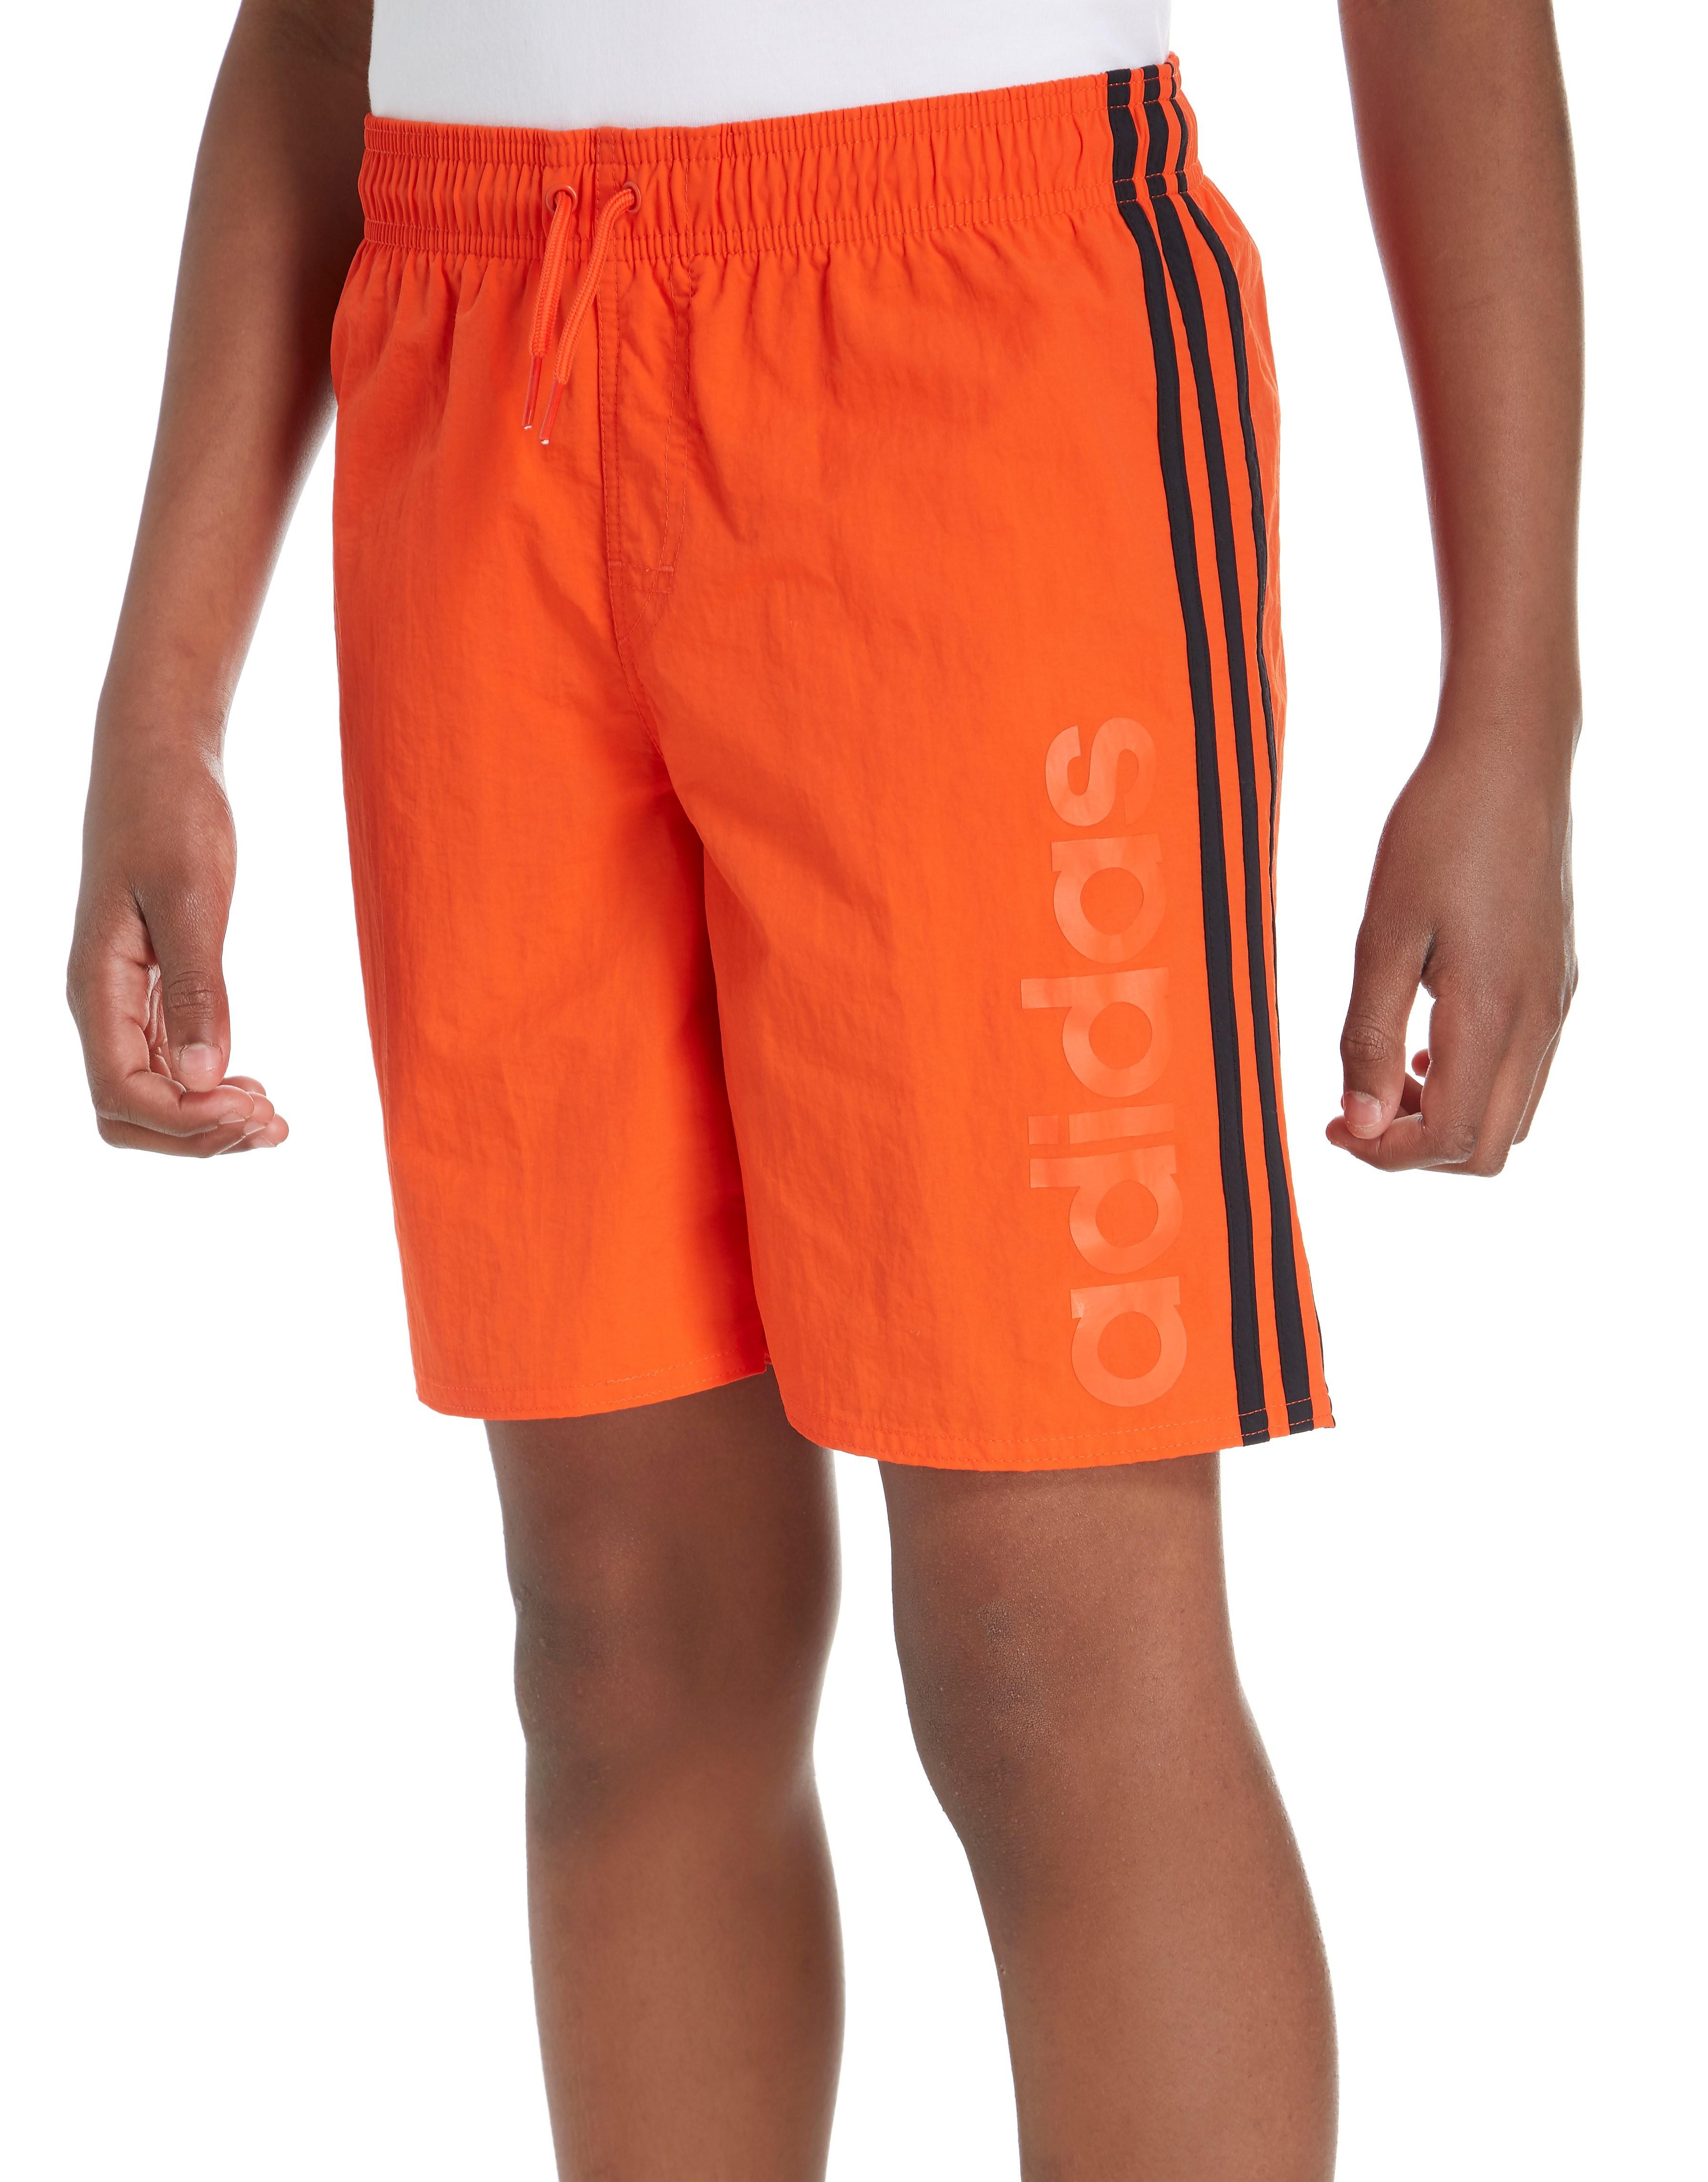 adidas Short de bain Linear - Only at JD - Orange/Black, Orange/Black